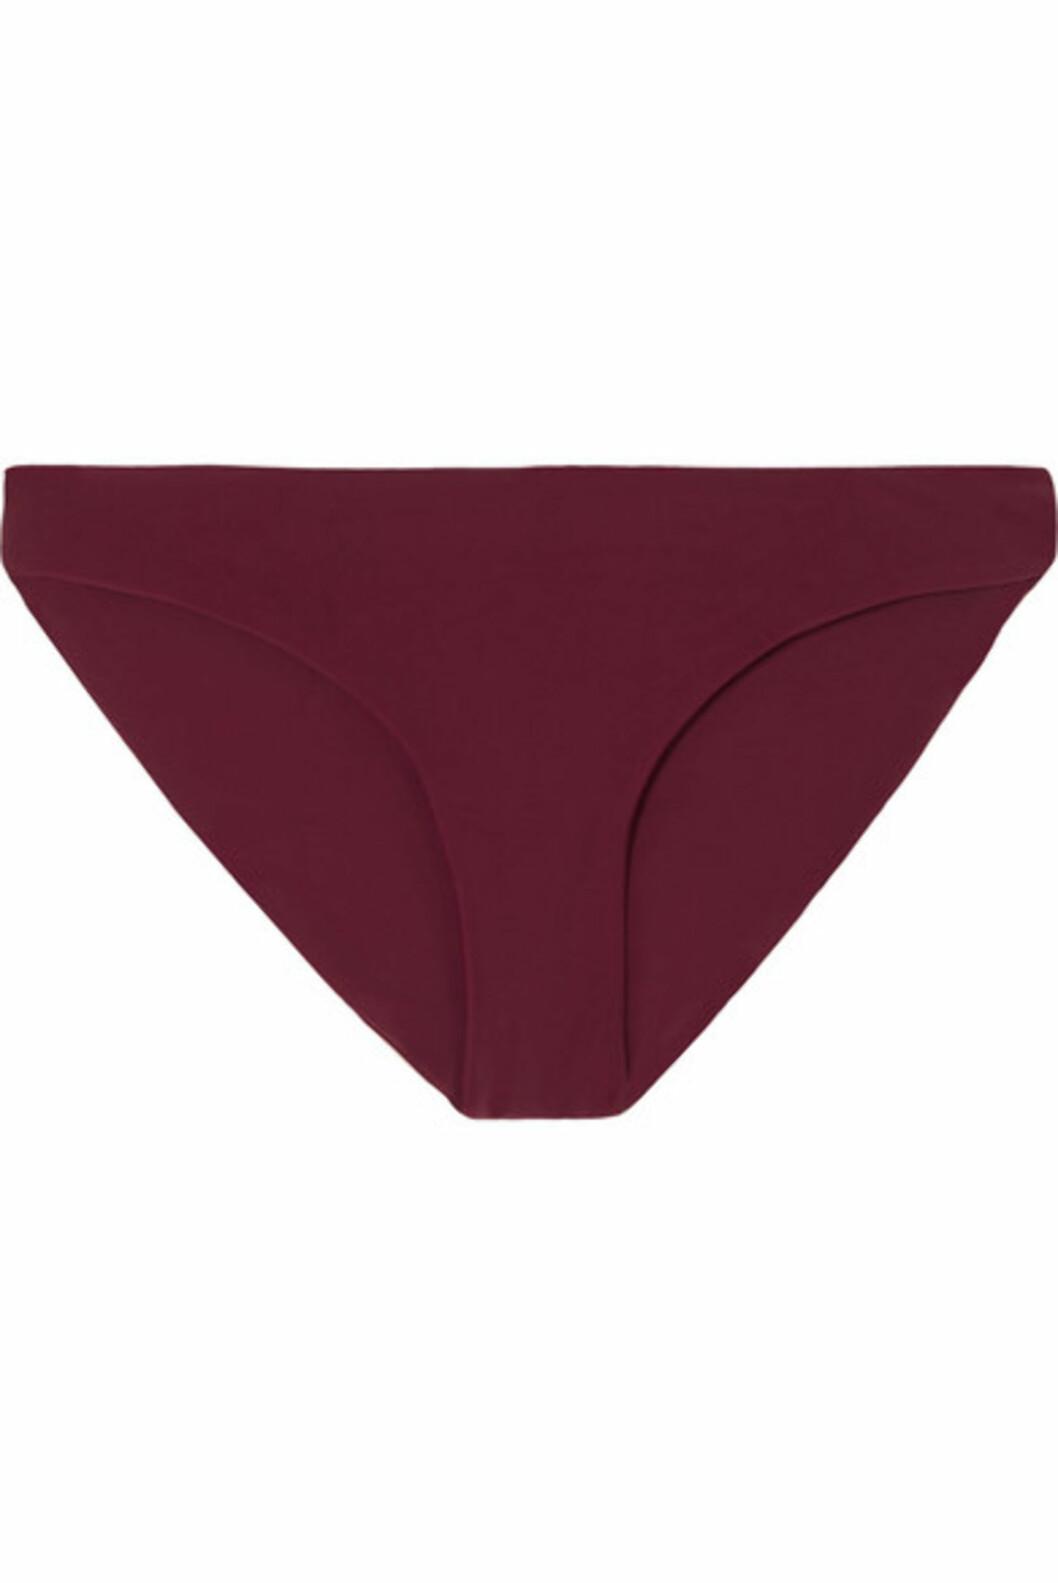 <strong>Bikinitruse fra Jade Swim  760,-  https:</strong>//www.net-a-porter.com/no/en/product/1073190/Jade_Swim/lure-bikini-briefs